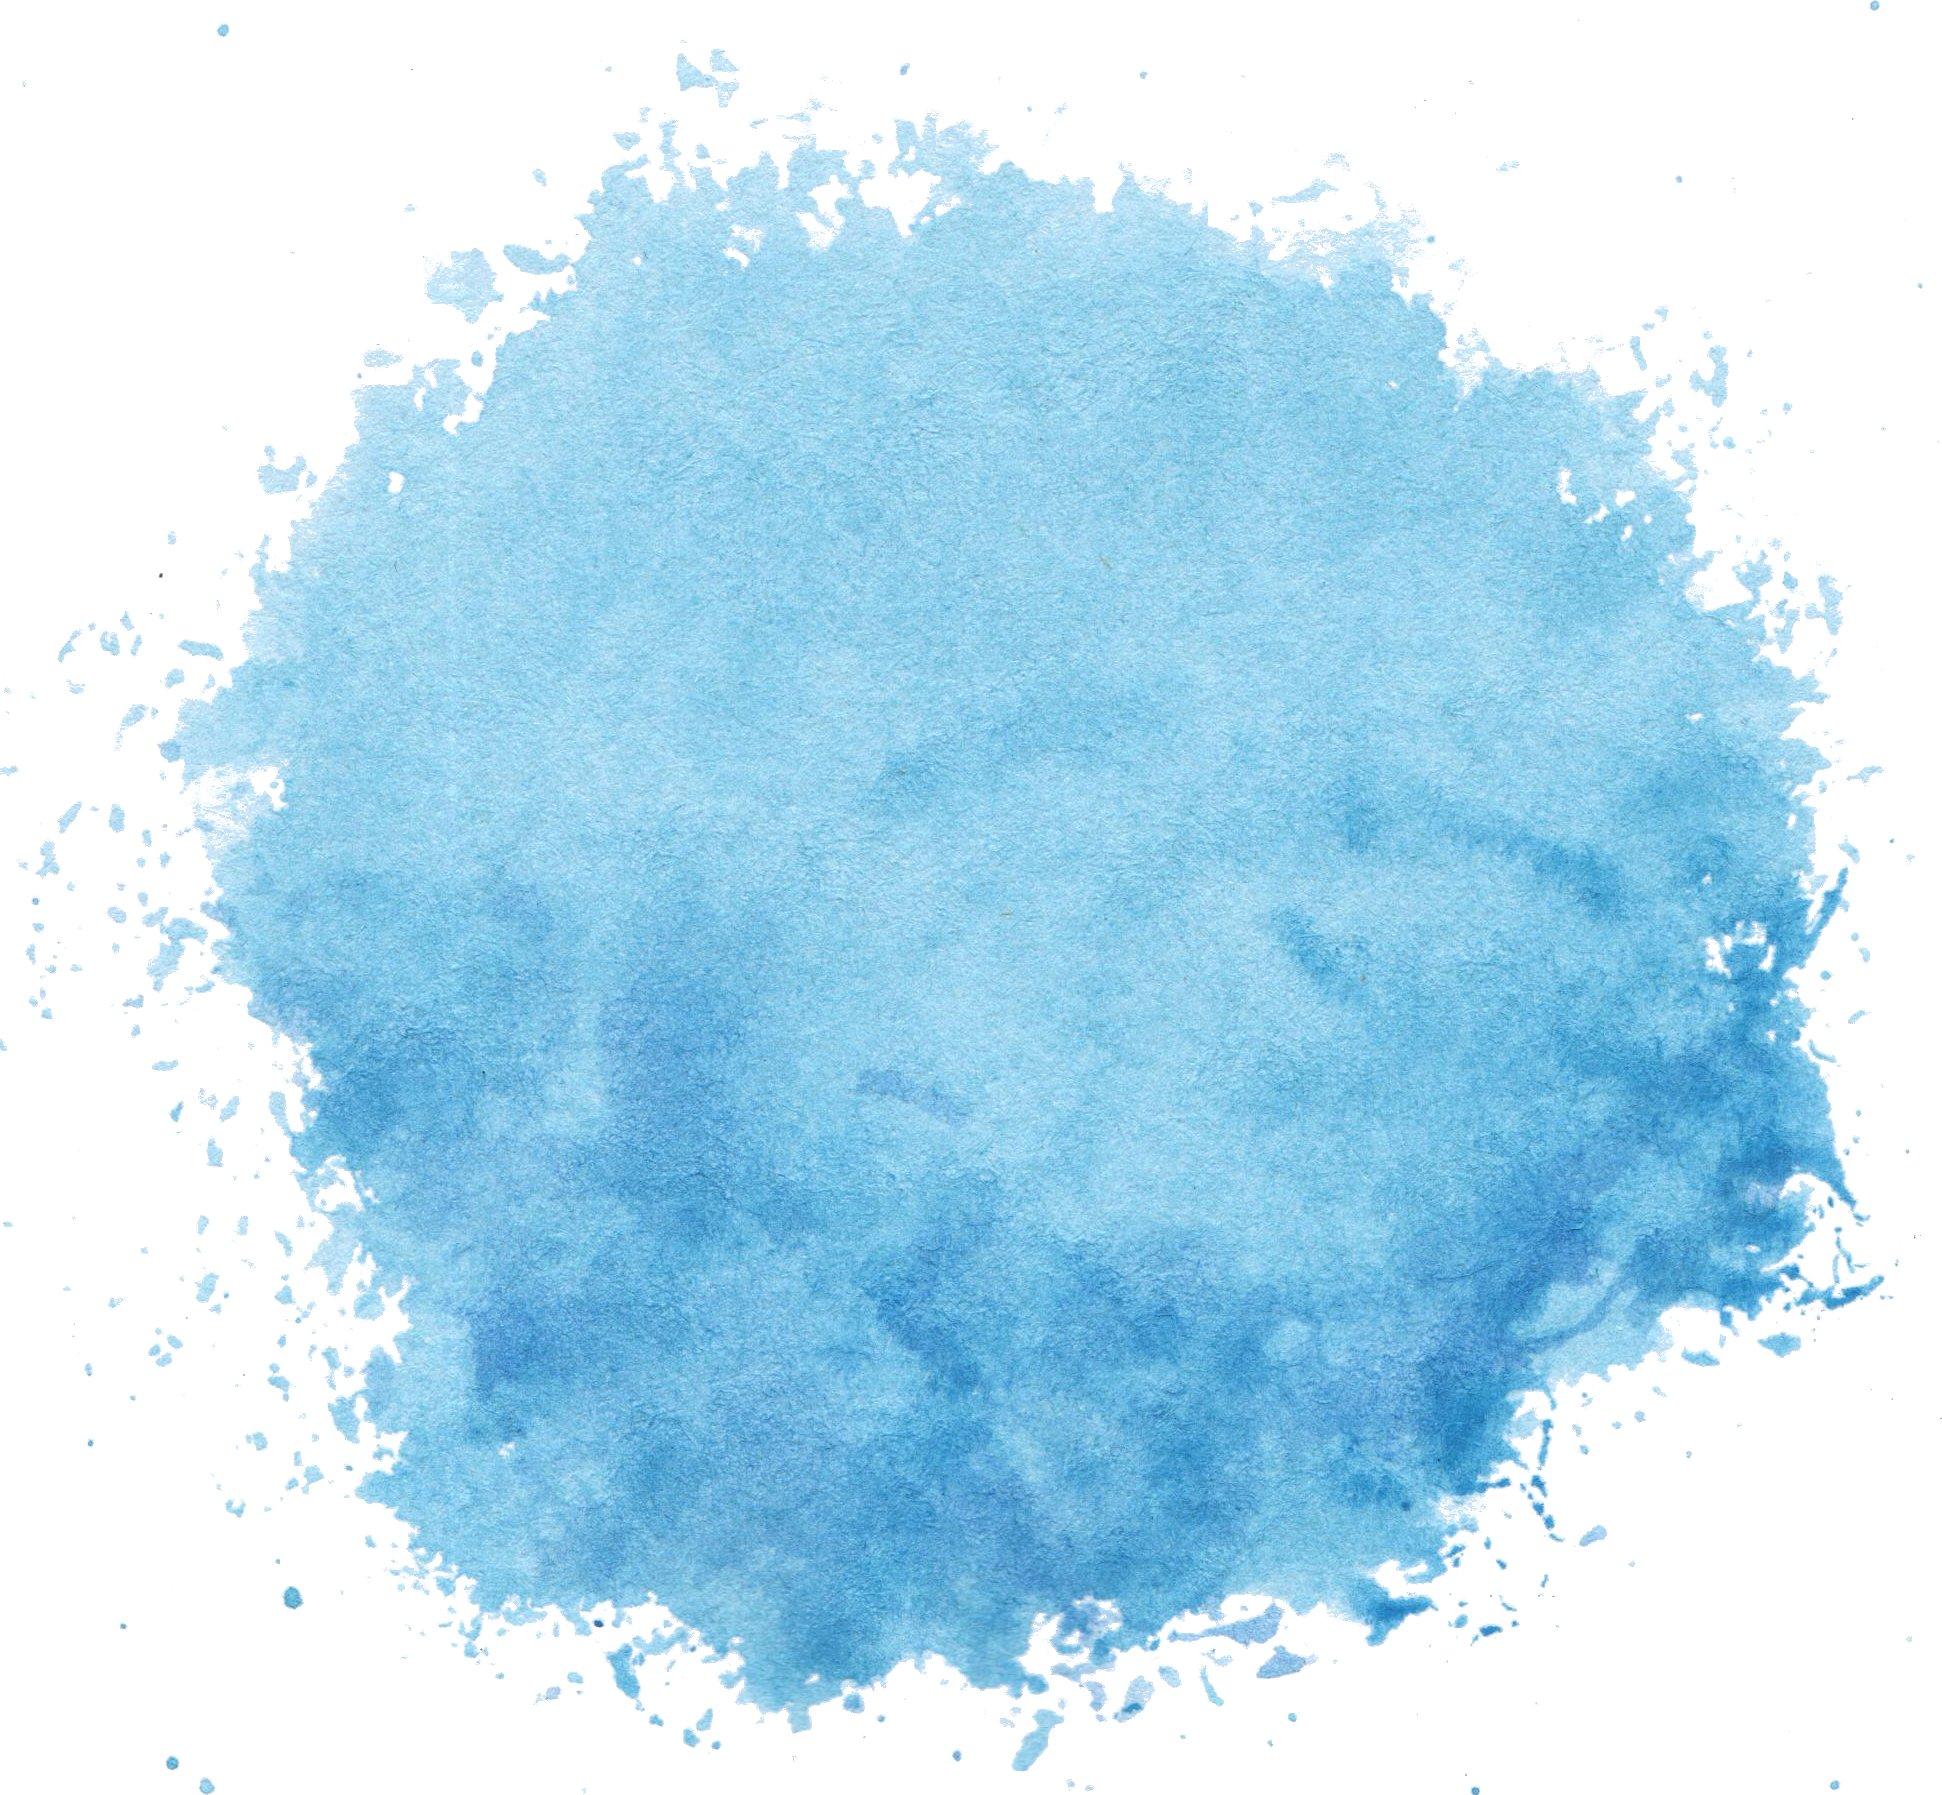 5 Blue Watercolor Texture (JPG)   OnlyGFX.com